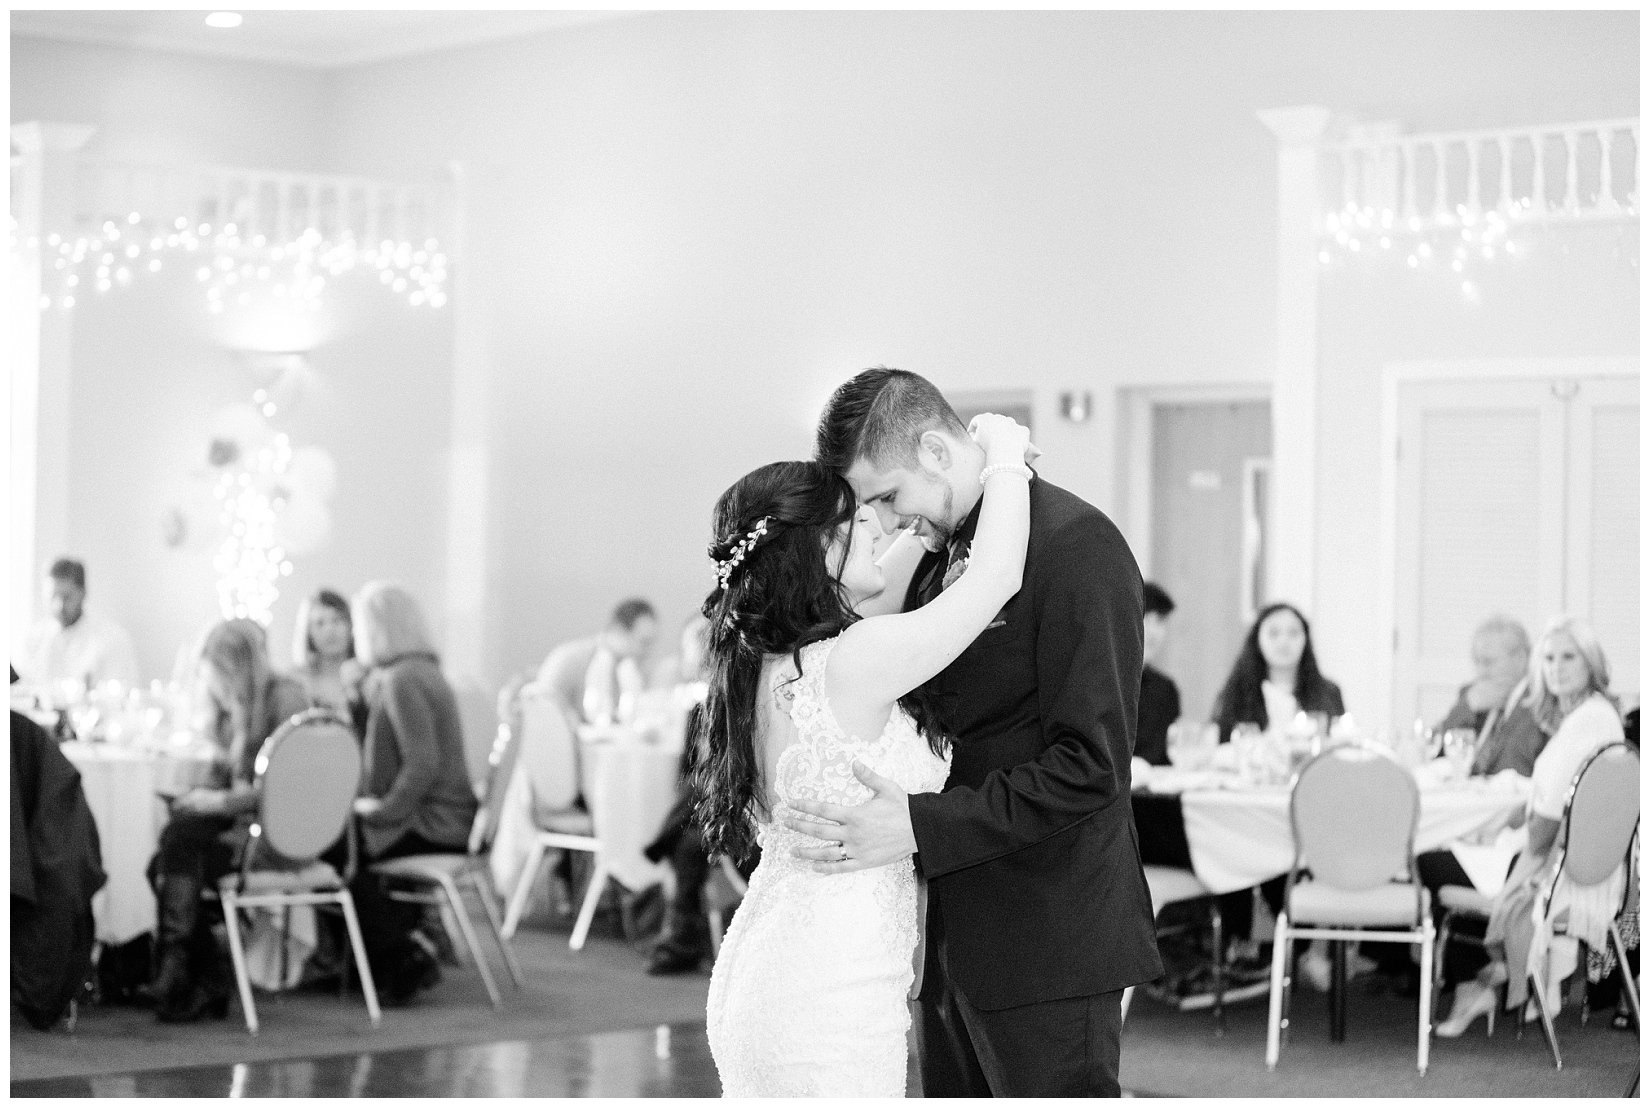 cat-alkire-wedding-photographer-indiana-chicago-indianapolis-fort-wayne_1120.jpg